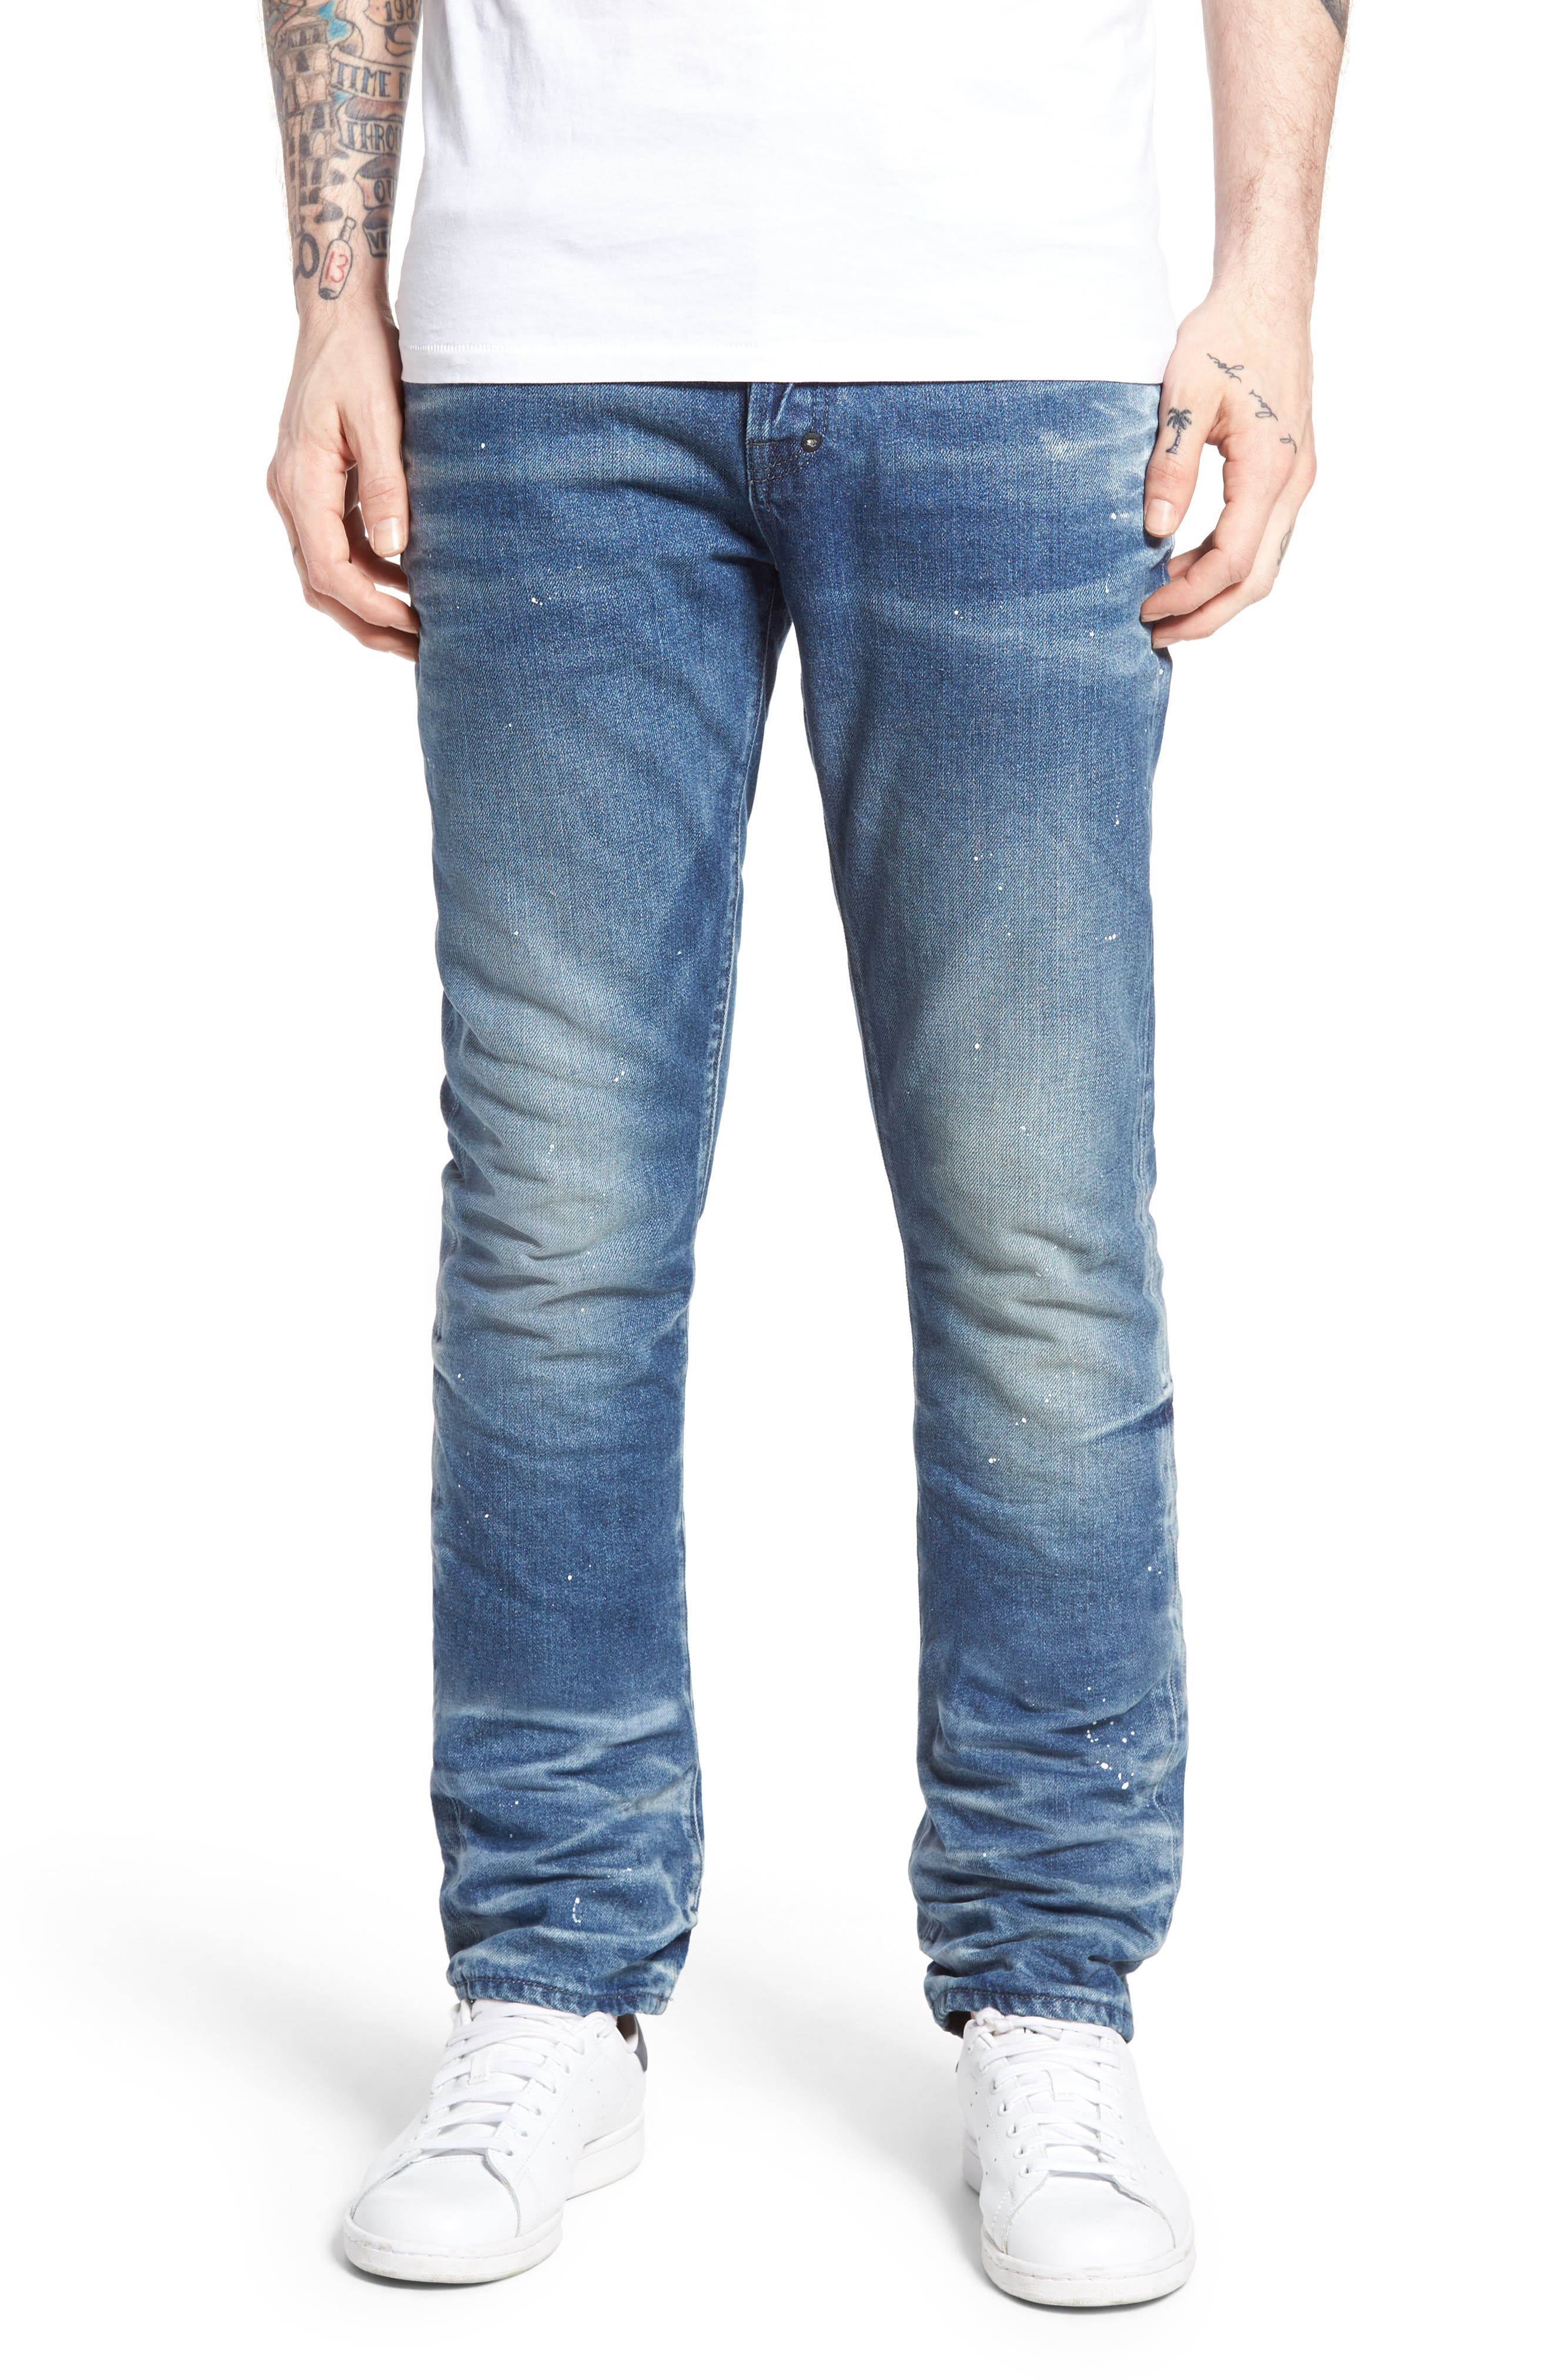 Demon Slim Straight Leg Jeans,                             Main thumbnail 1, color,